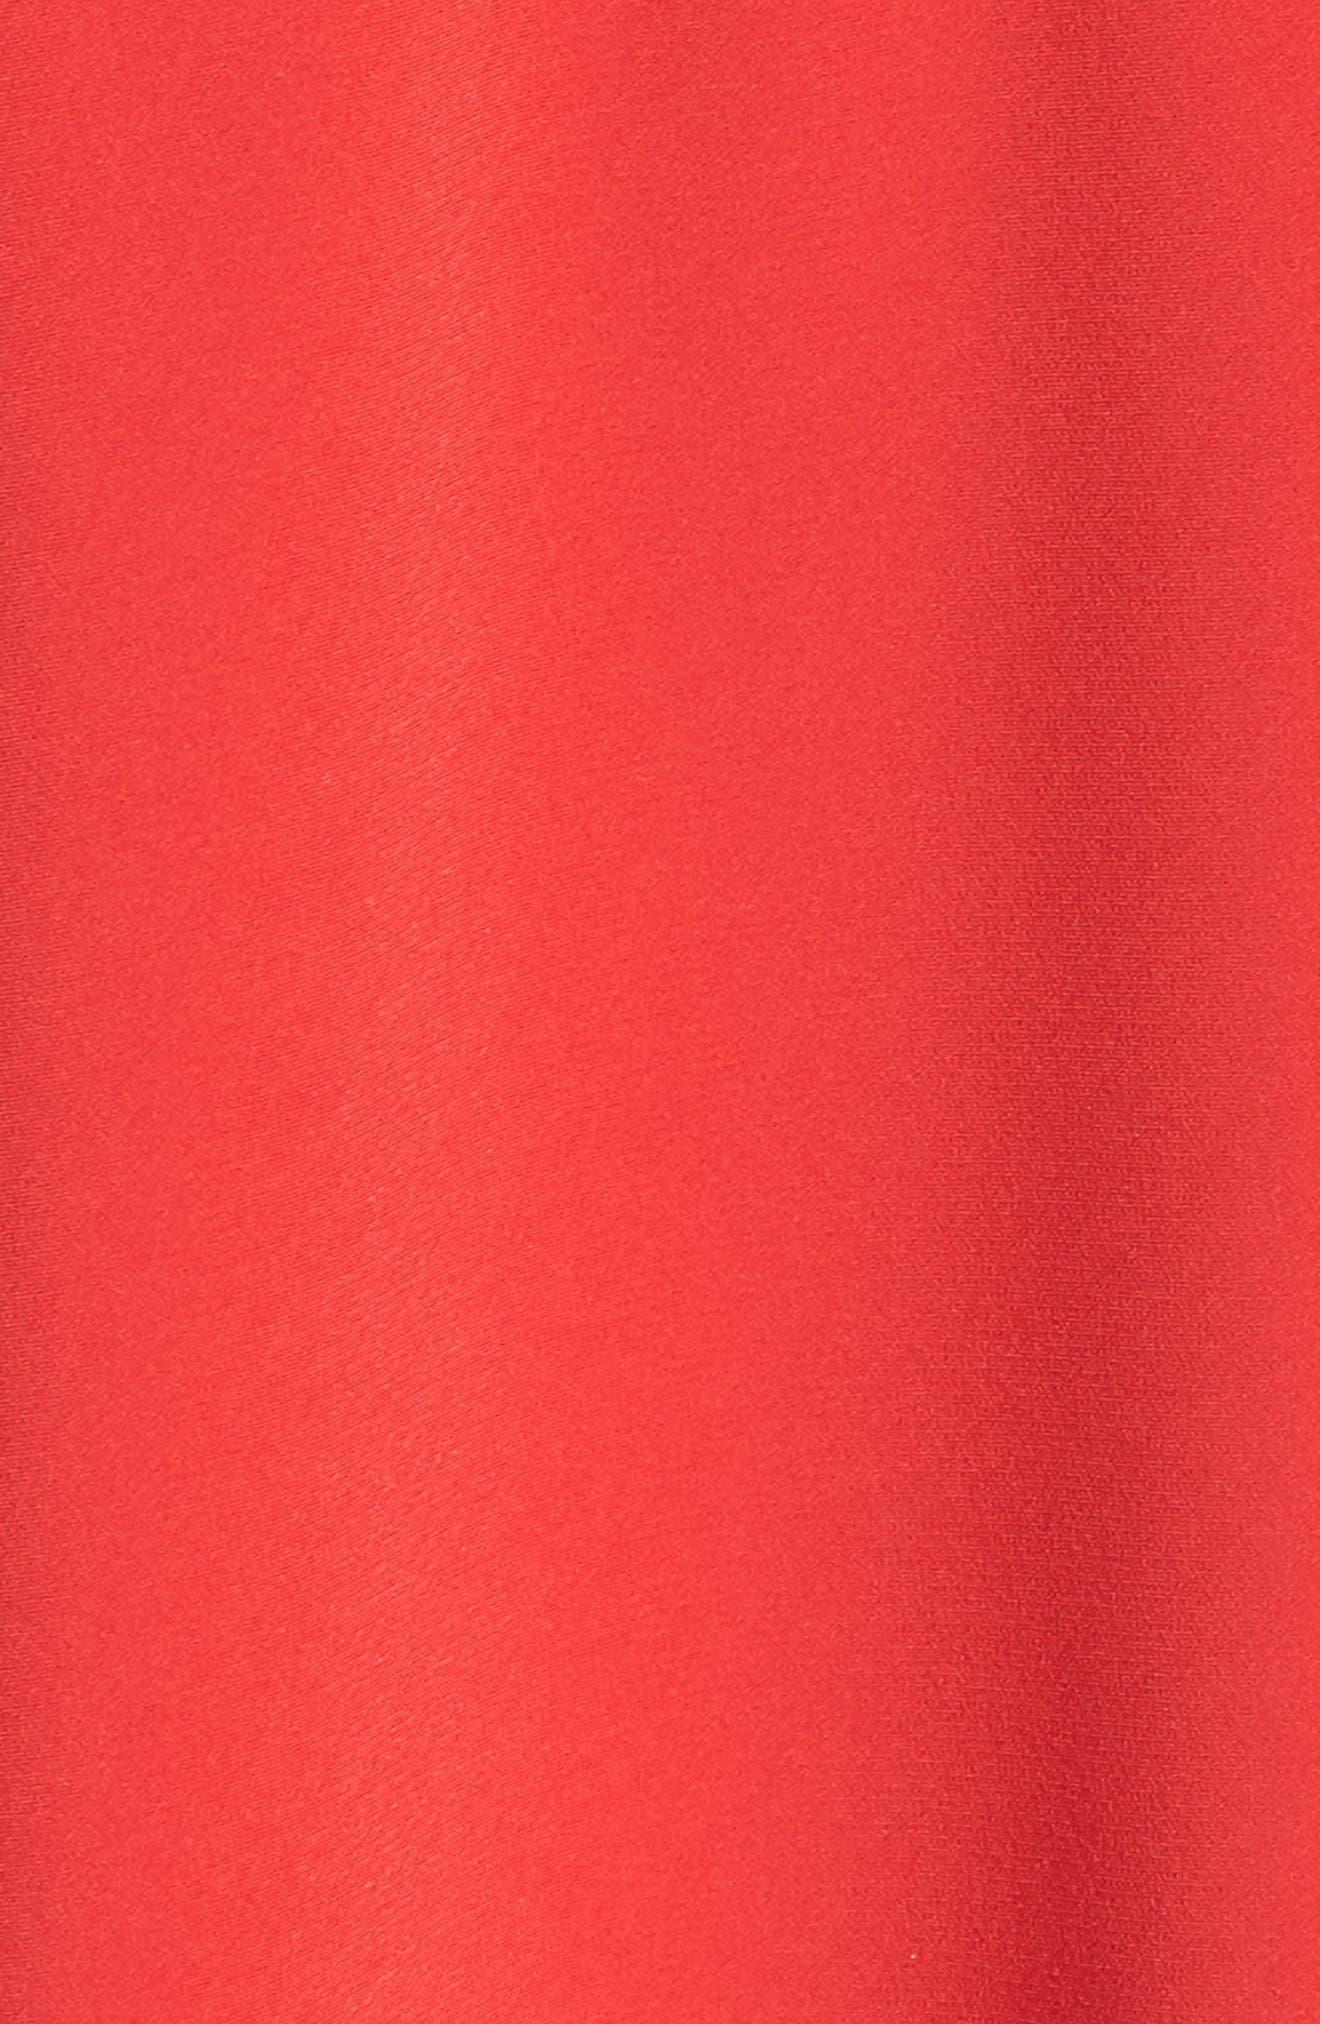 Tie Waist Shirtdress,                             Alternate thumbnail 5, color,                             Tomato